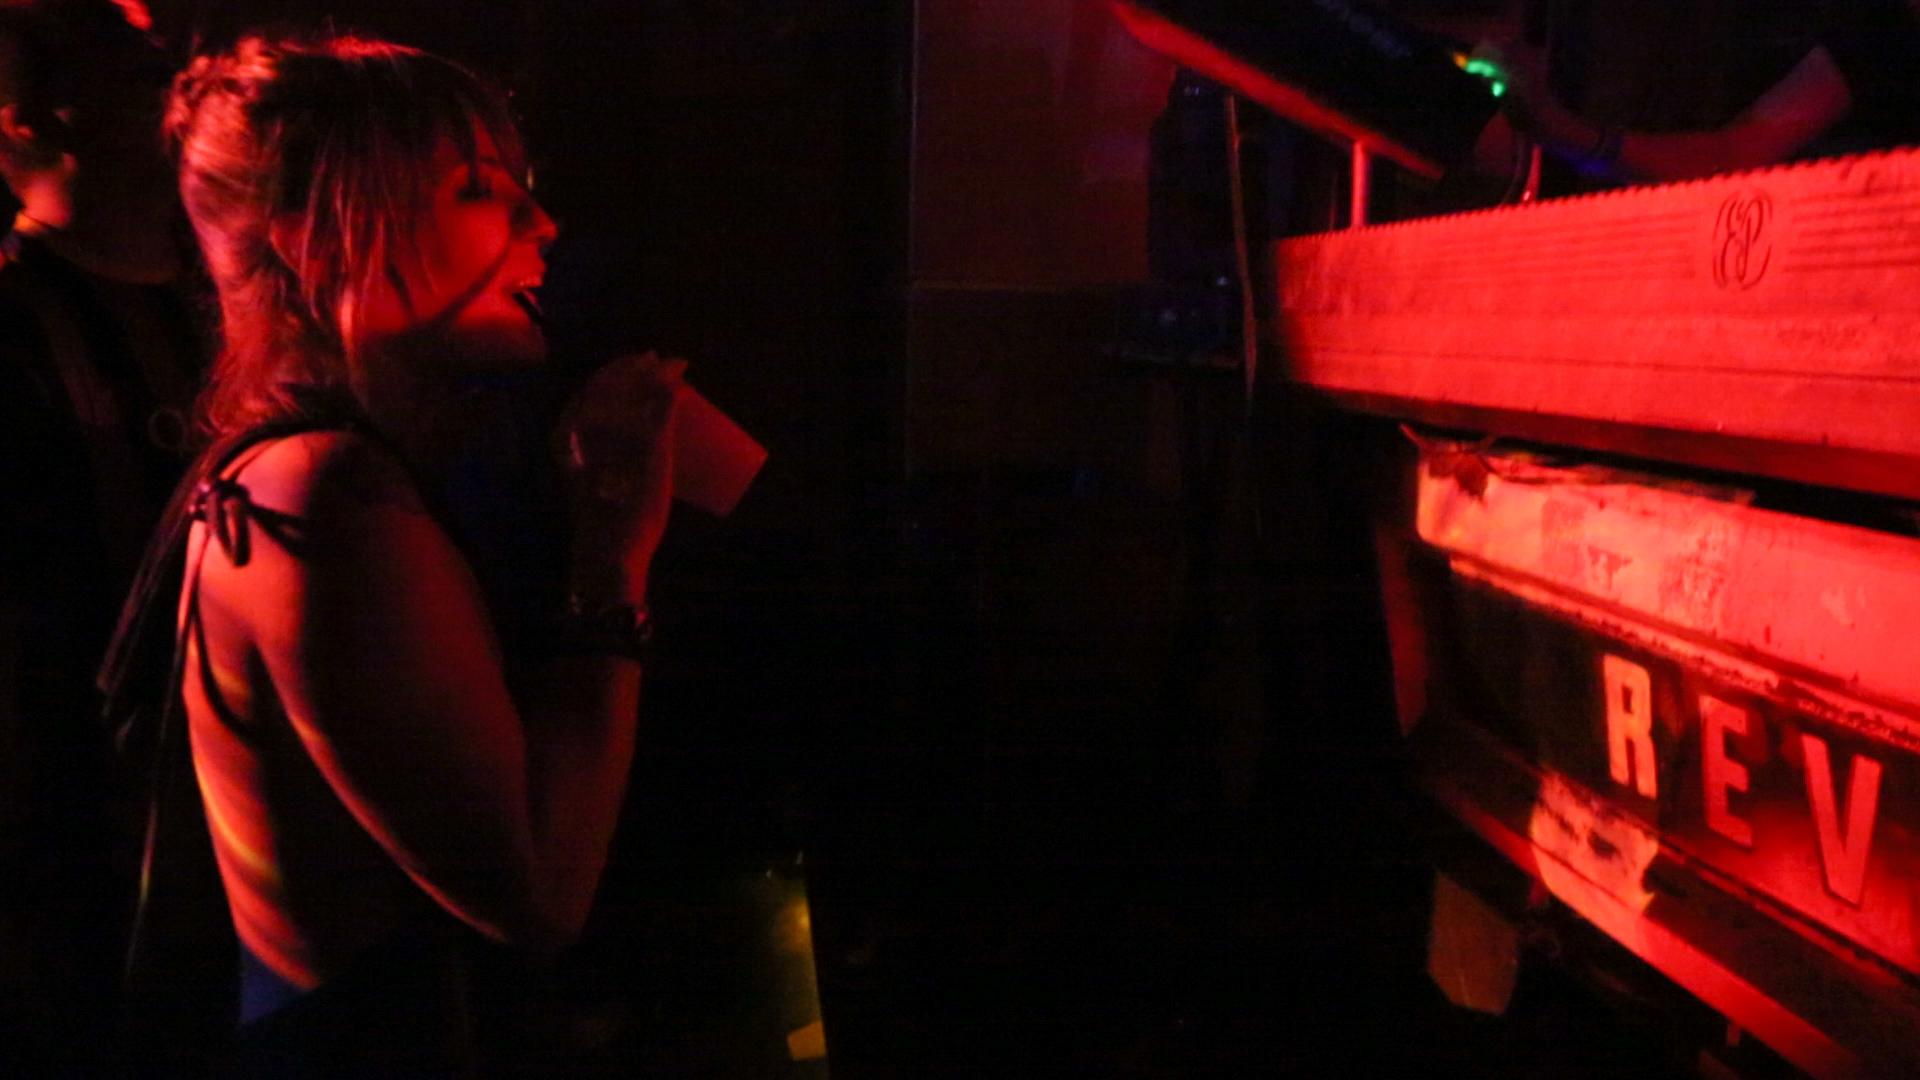 CYBoRGs--- The DaRk SiDe-182.jpg